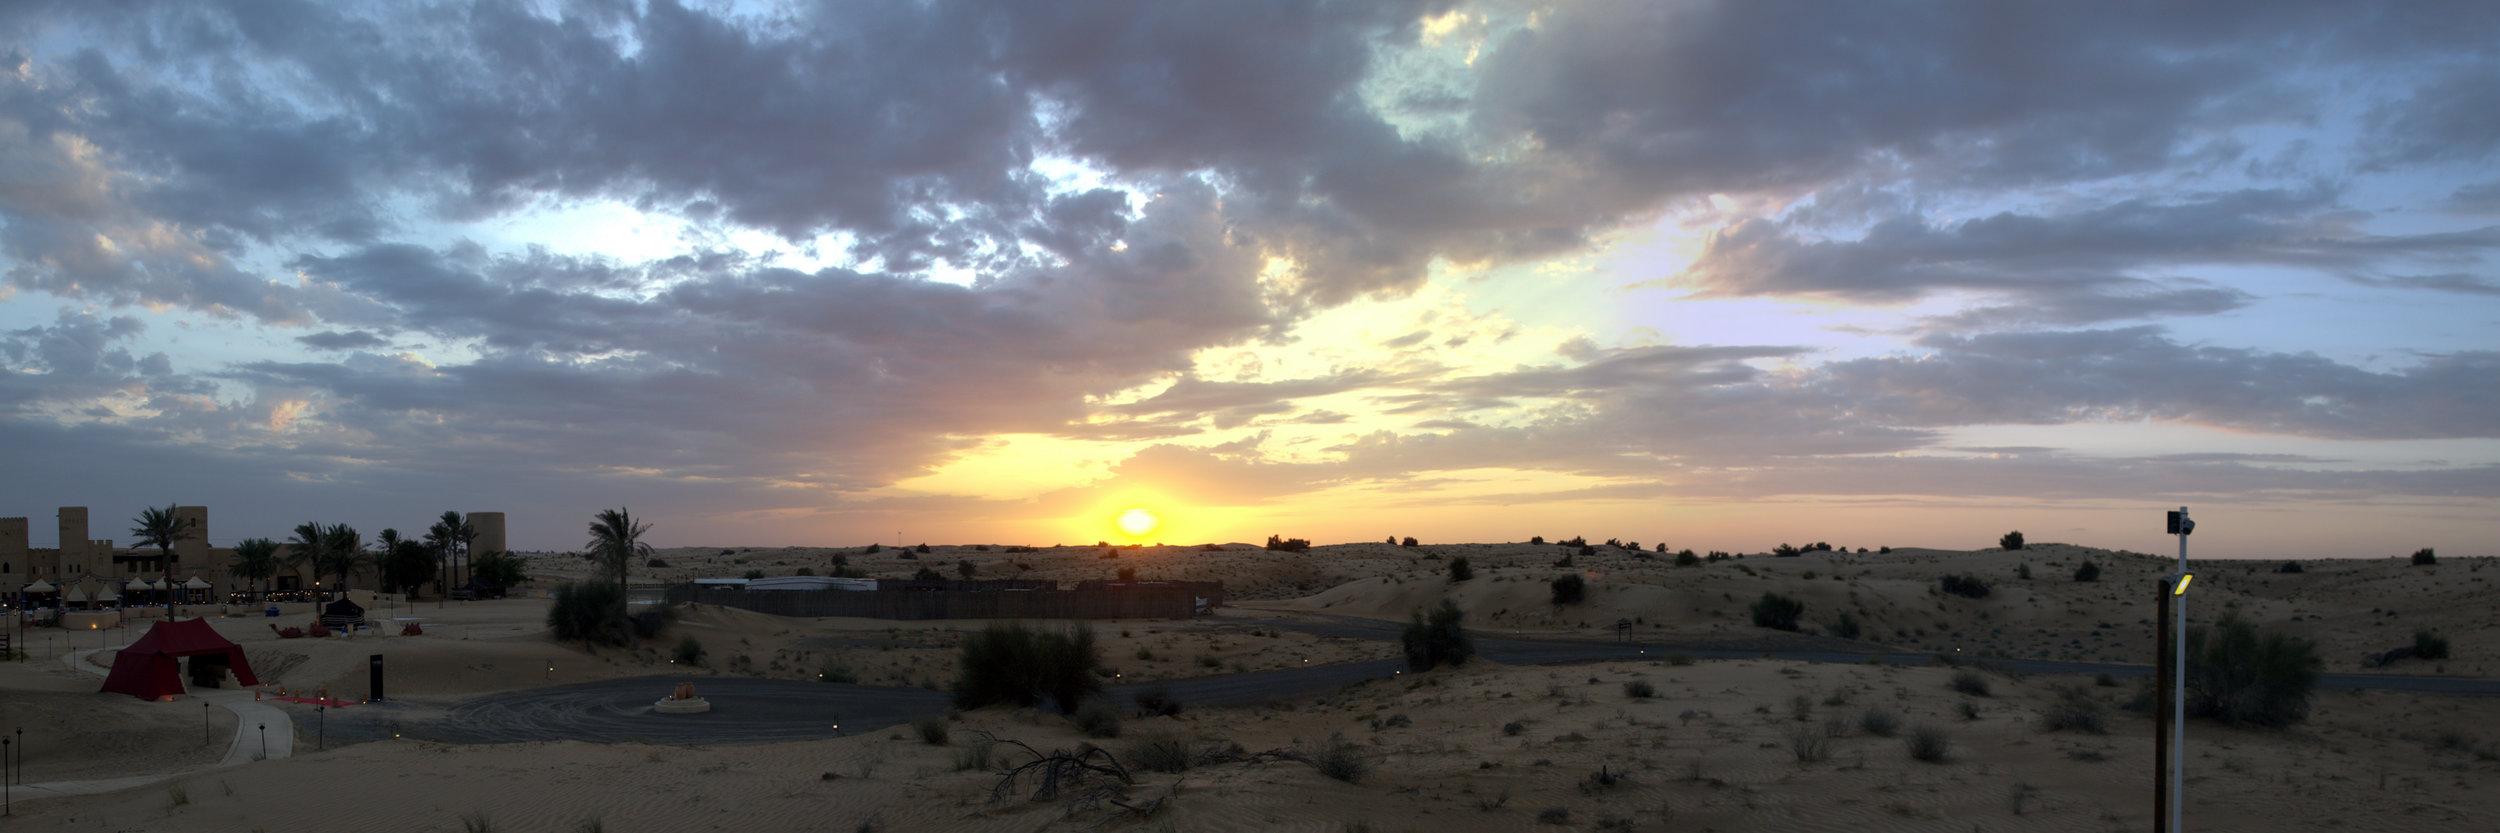 Wüste03.jpg